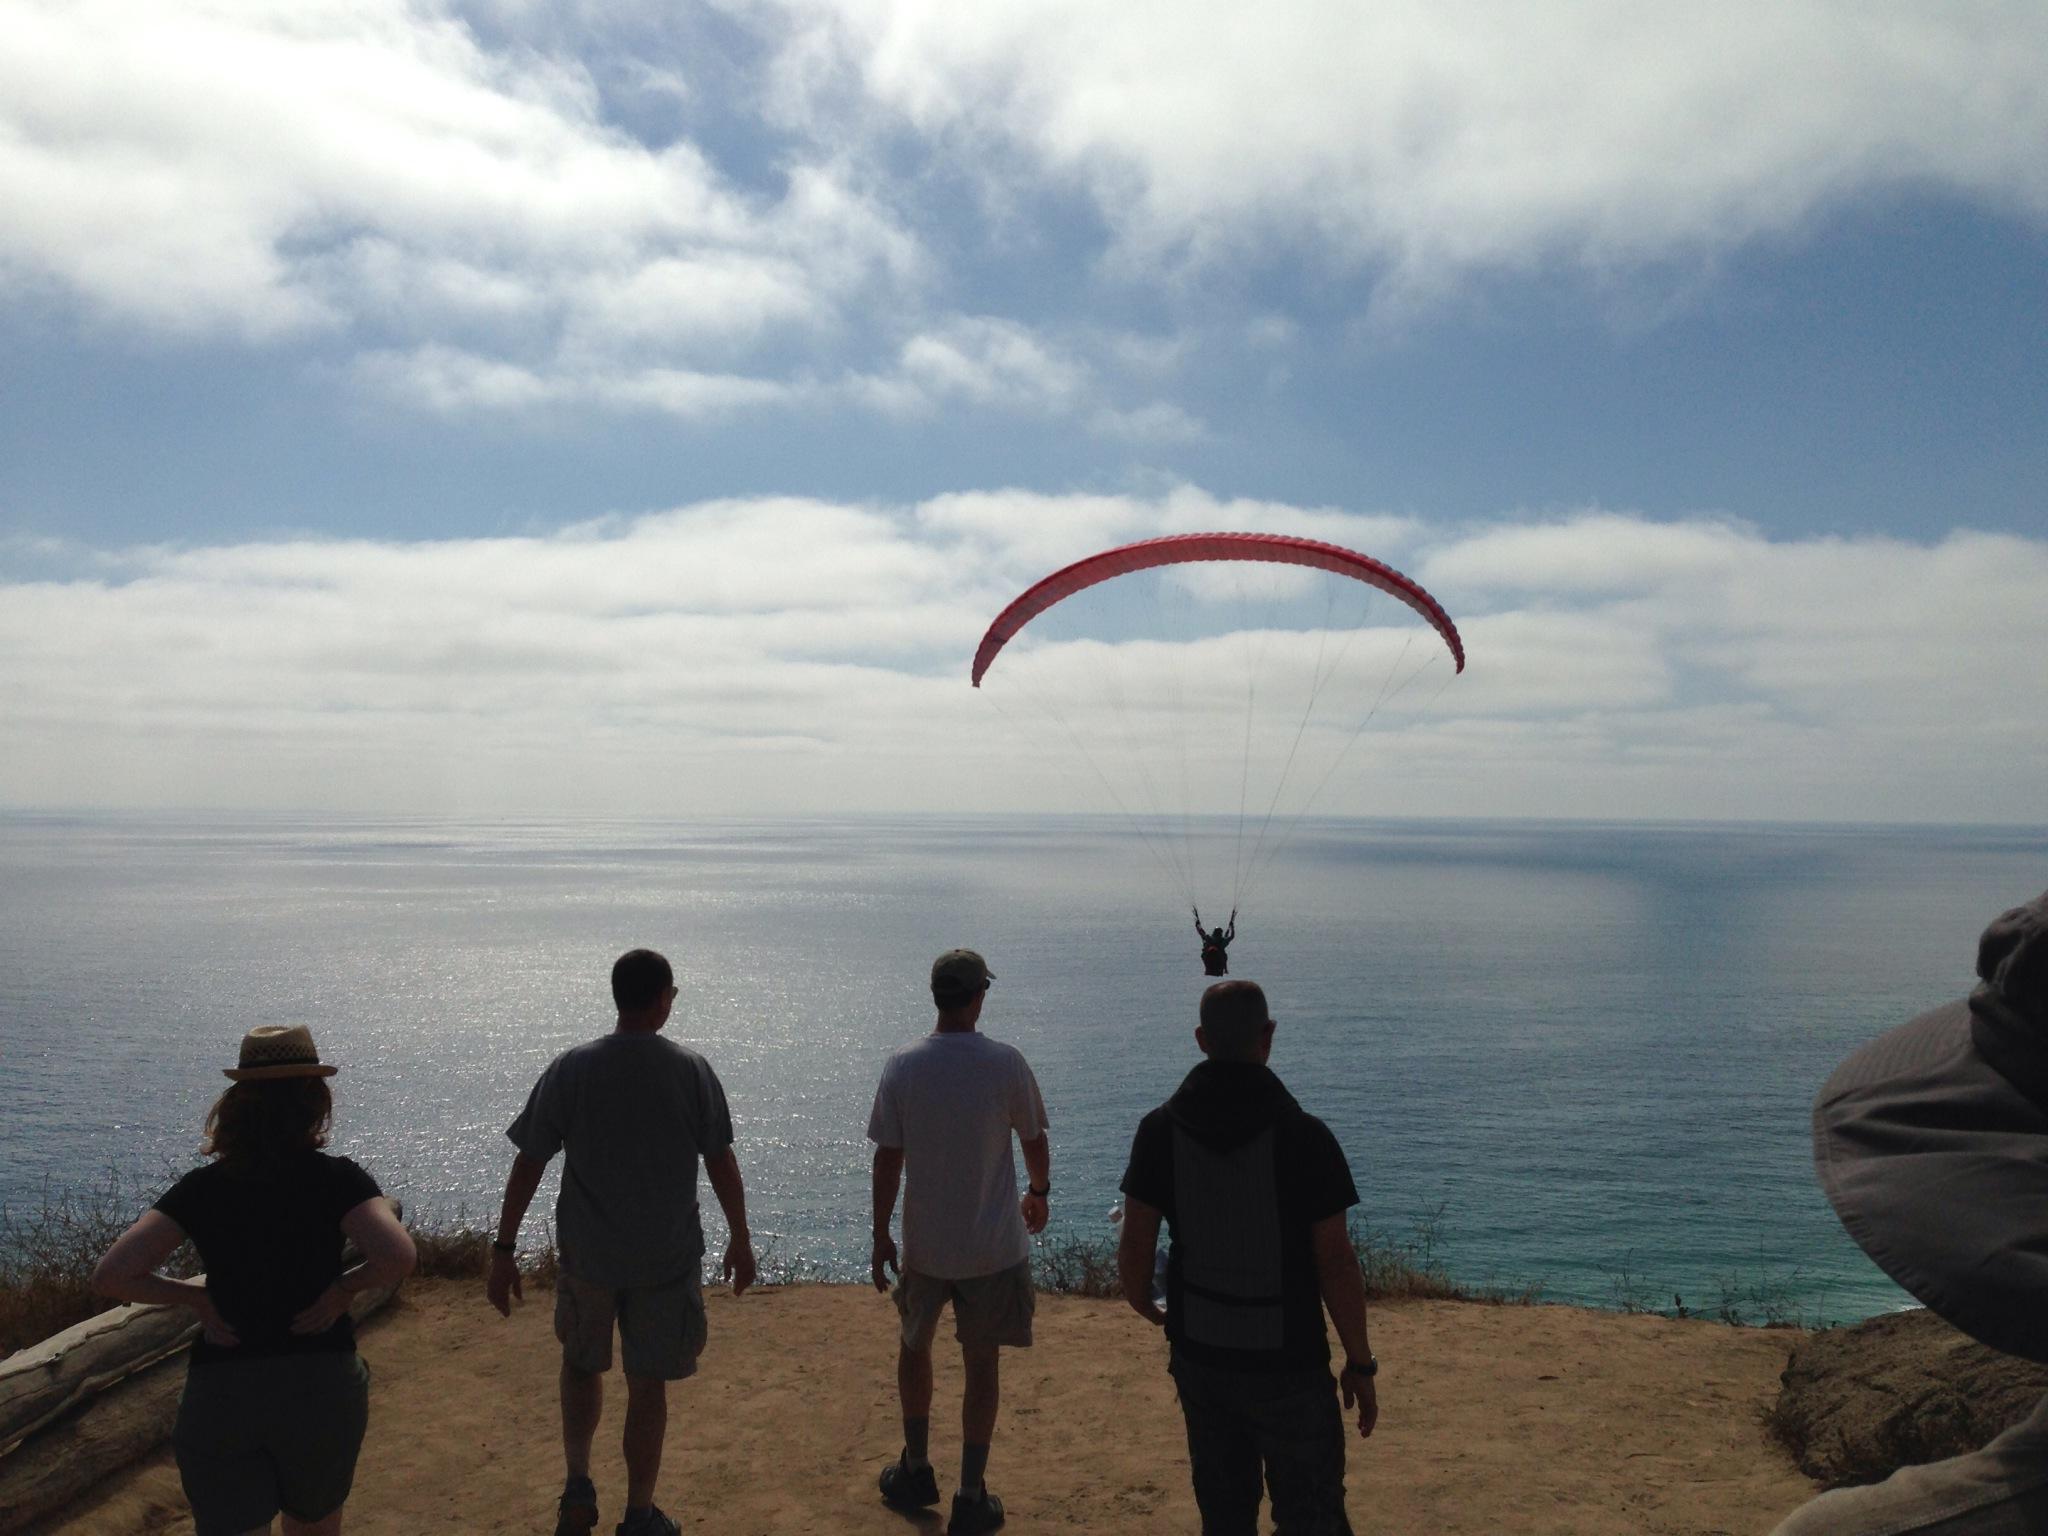 Sunset walks along the La Jolla cliffs with Robert Crais, Kim Stanley Robinson, and Cory Doctorow.